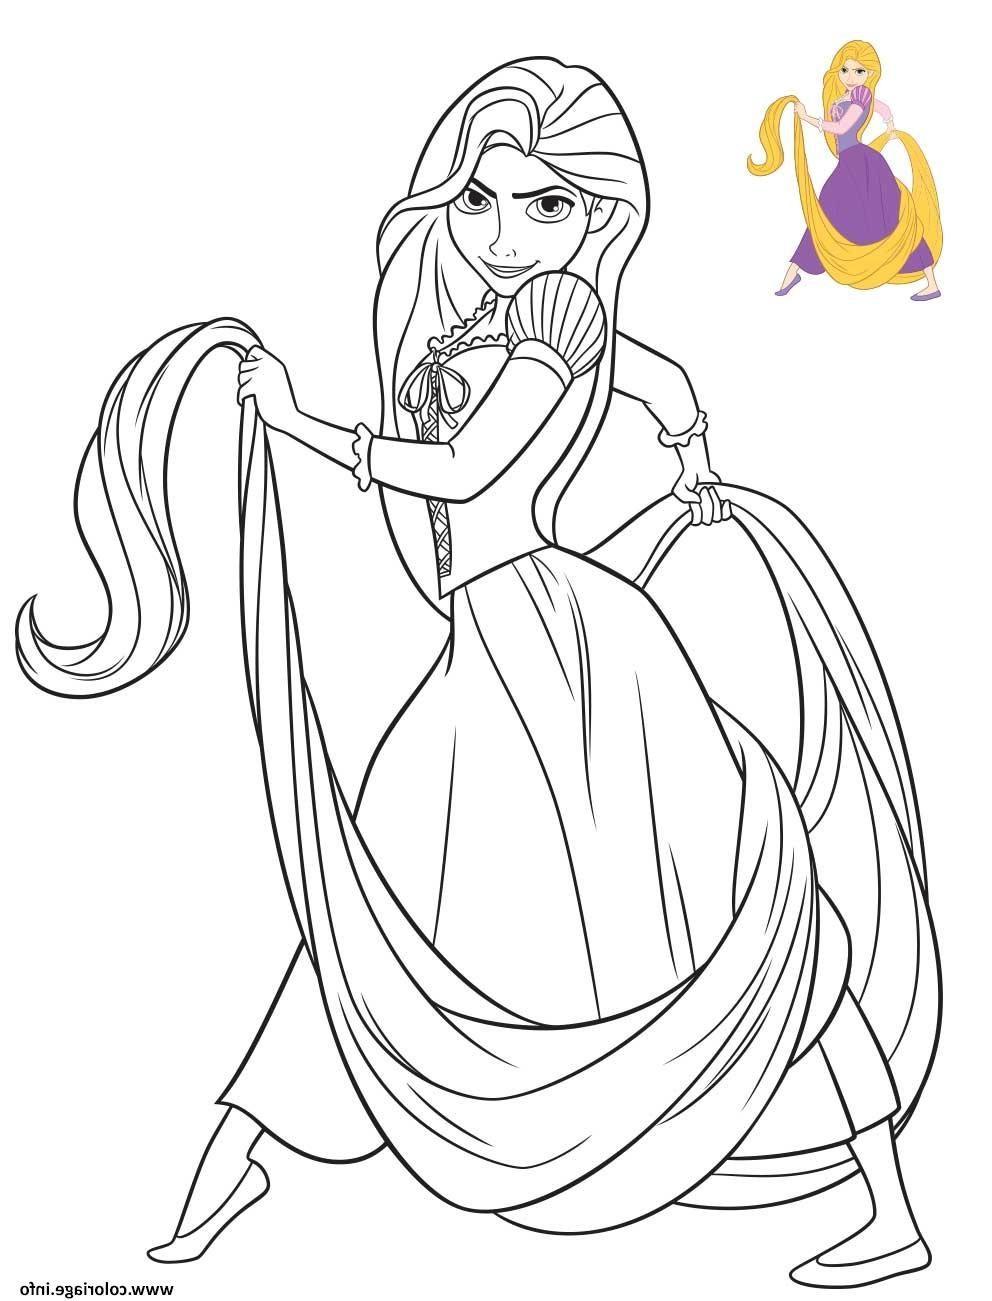 Coloriage Princesse Disney Raiponce dessin  Dessin raiponce